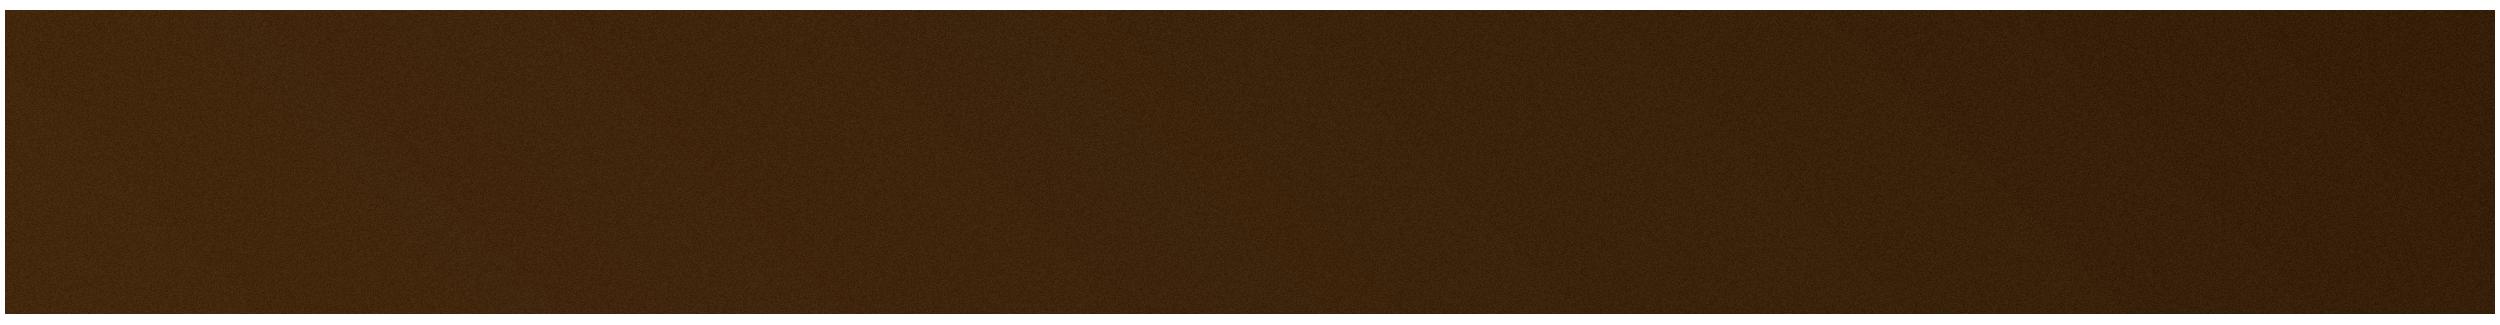 shit-shoes-logo.png